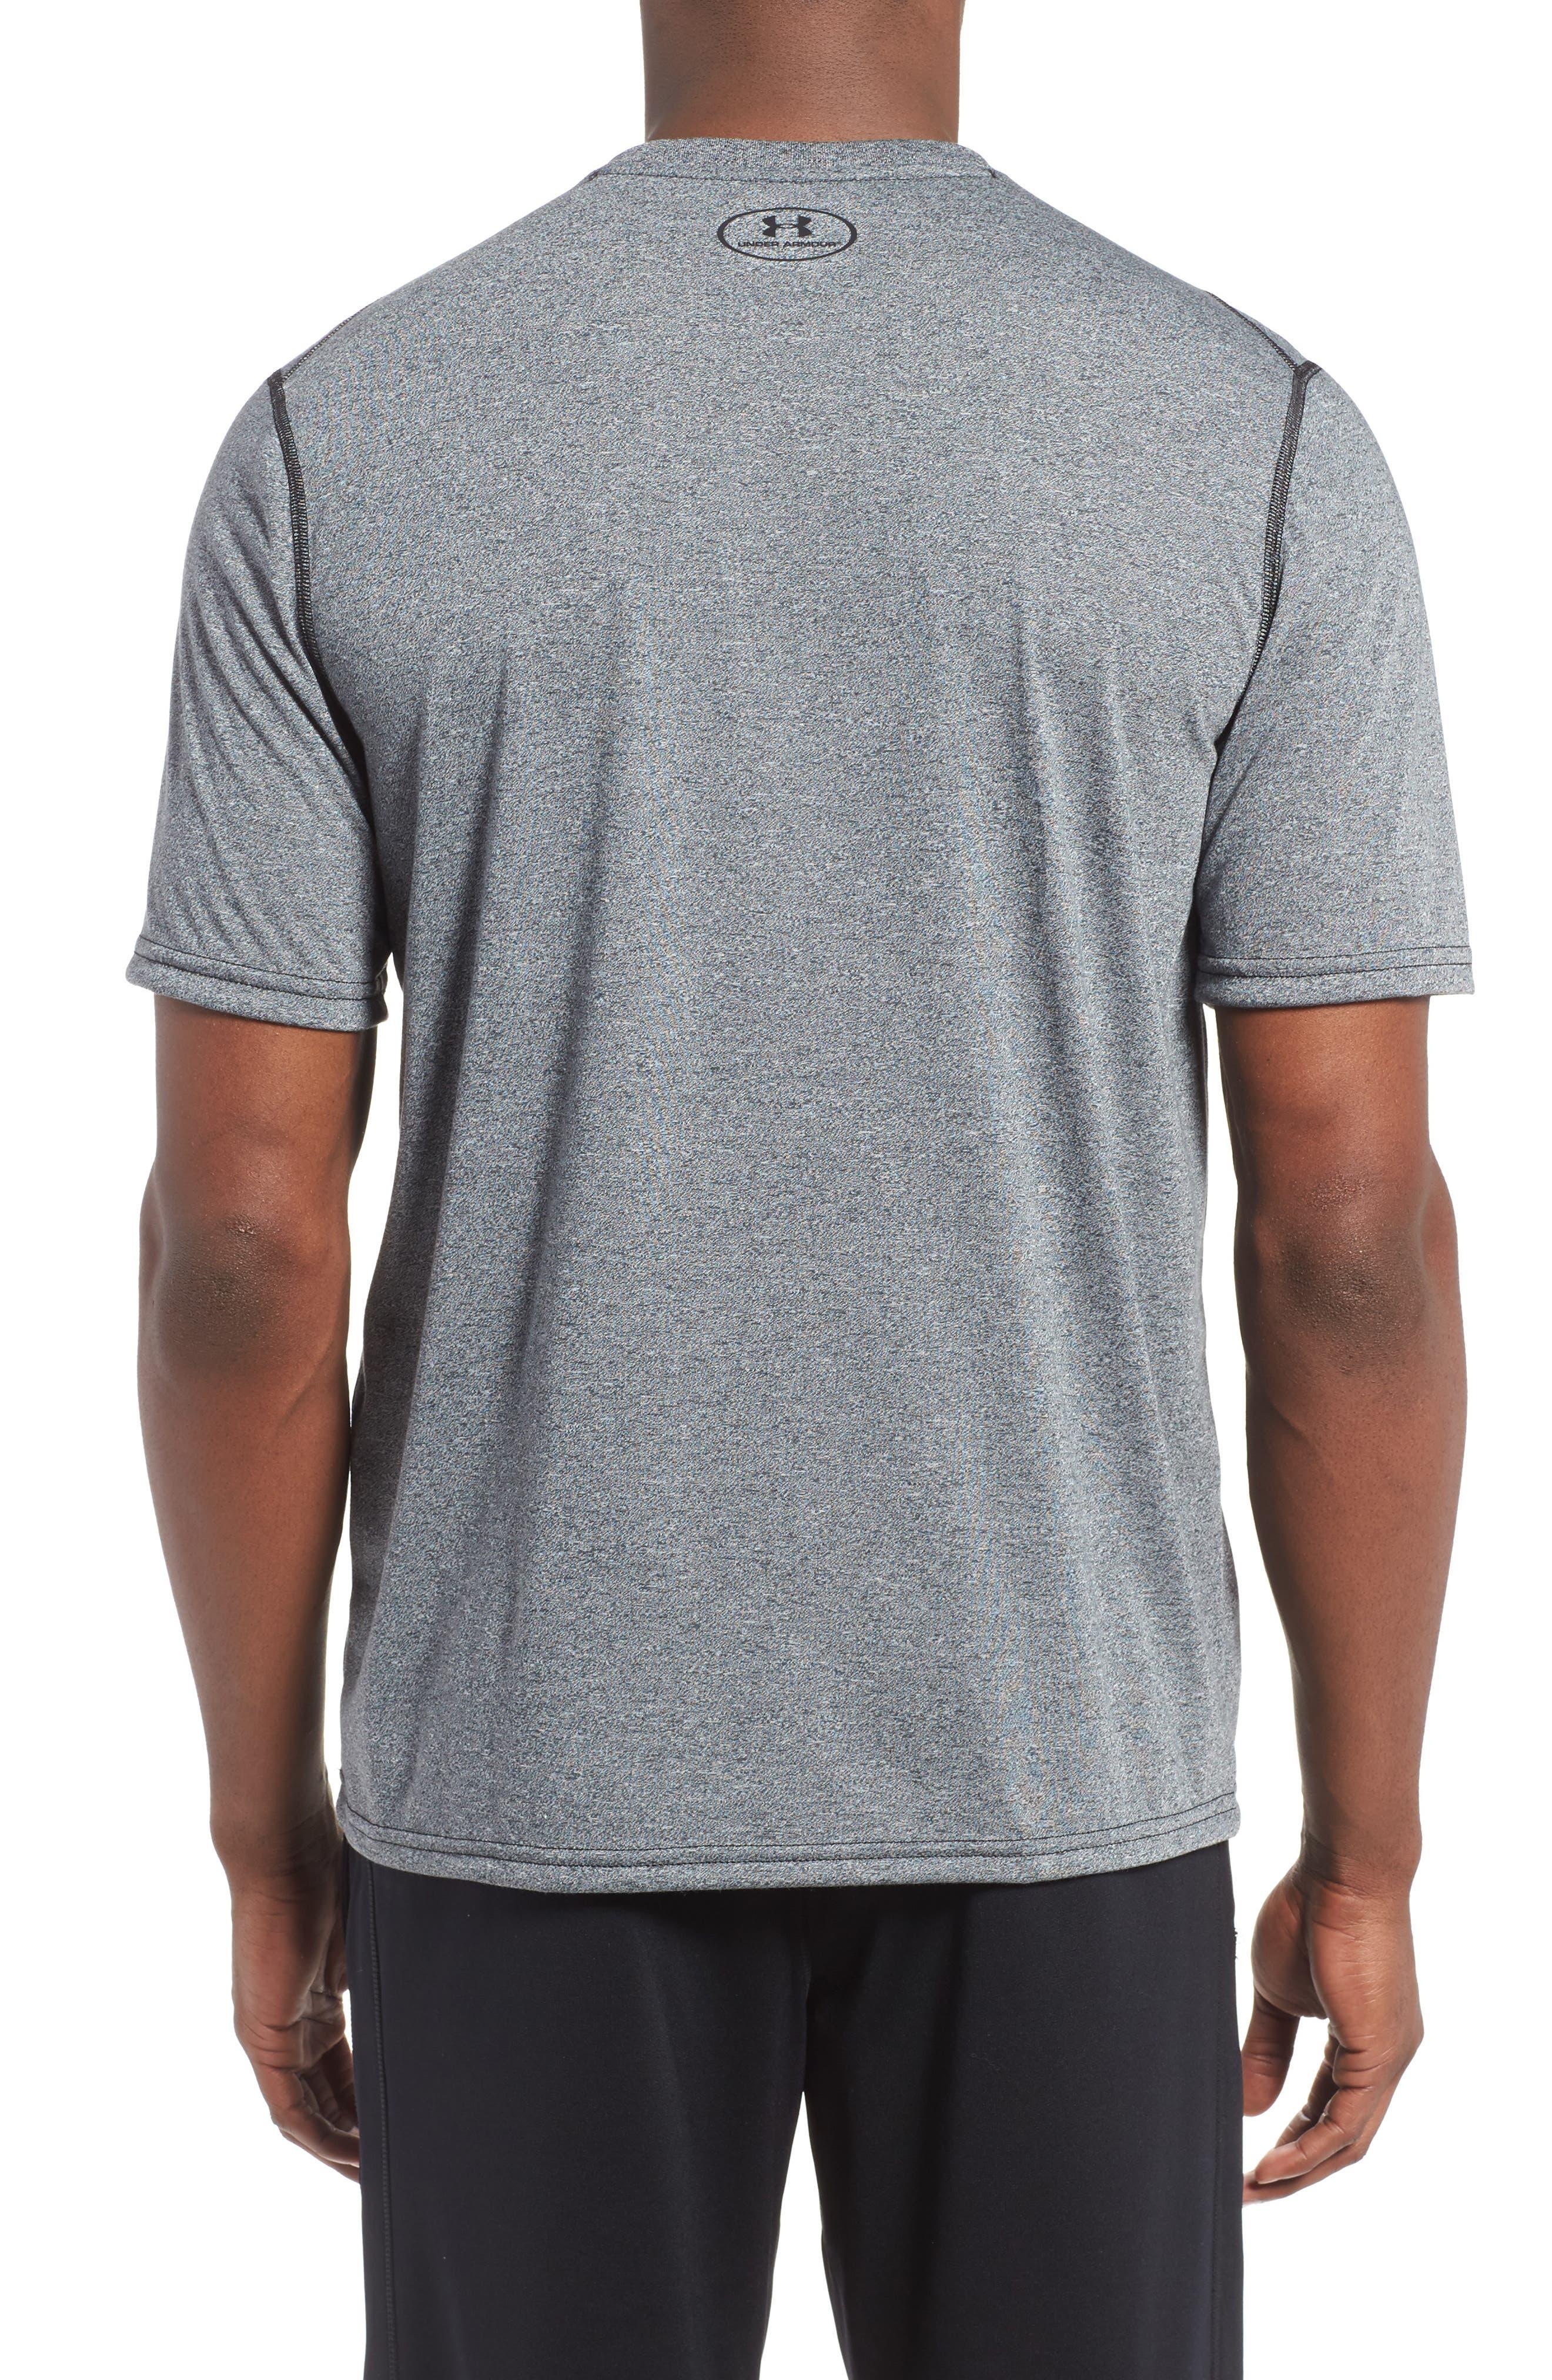 Regular Fit Threadborne T-Shirt,                             Alternate thumbnail 2, color,                             BLACK TWIST